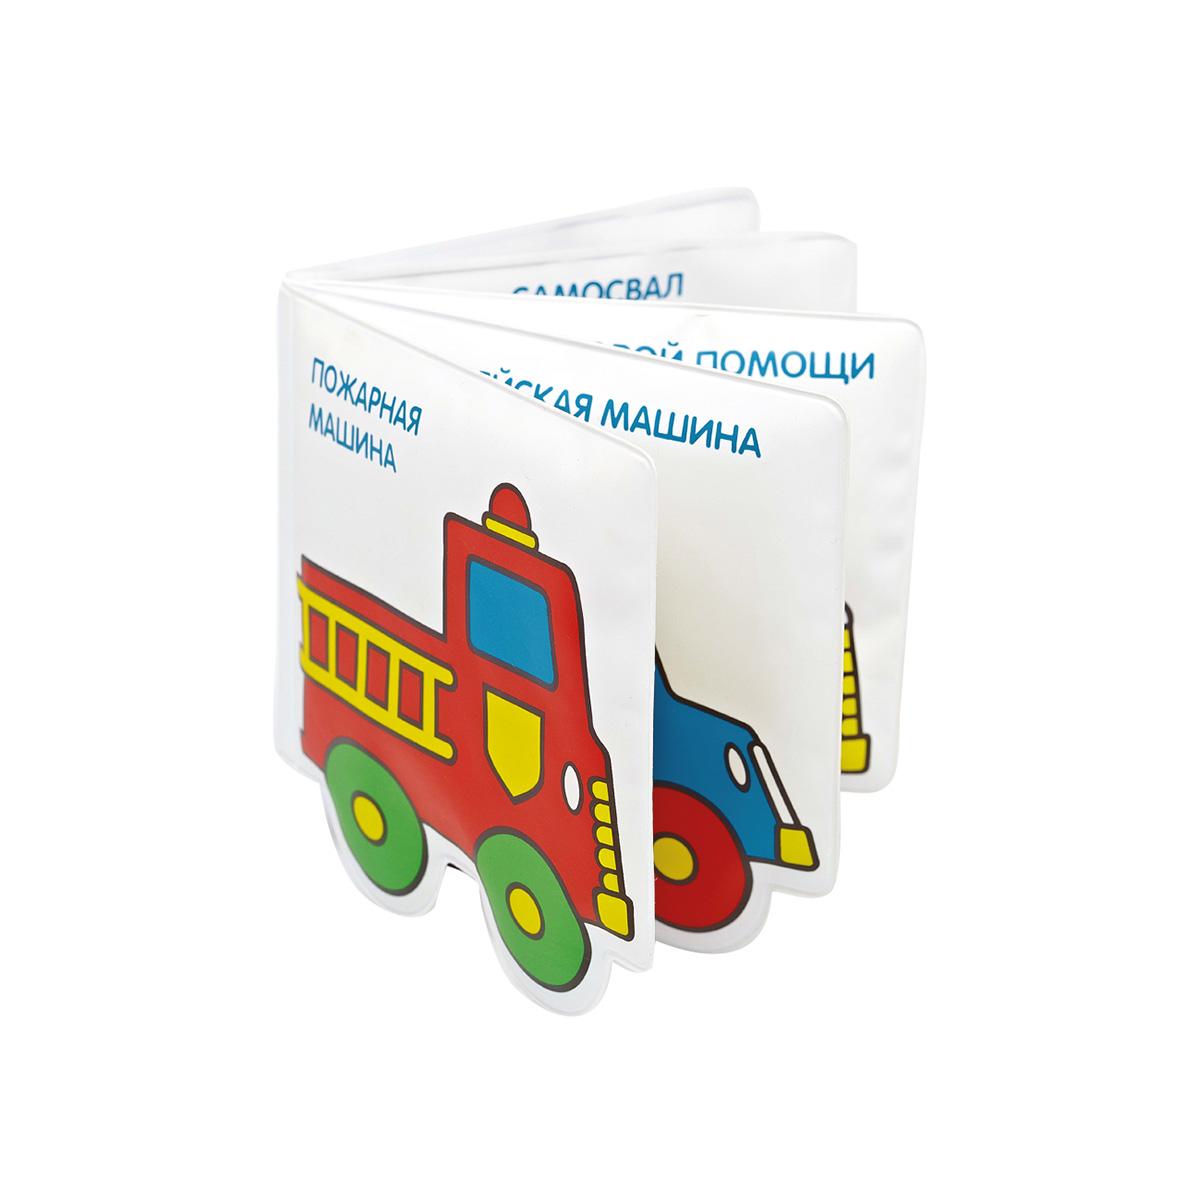 Курносики Игрушка-книжка с пищалкой Машинки27079